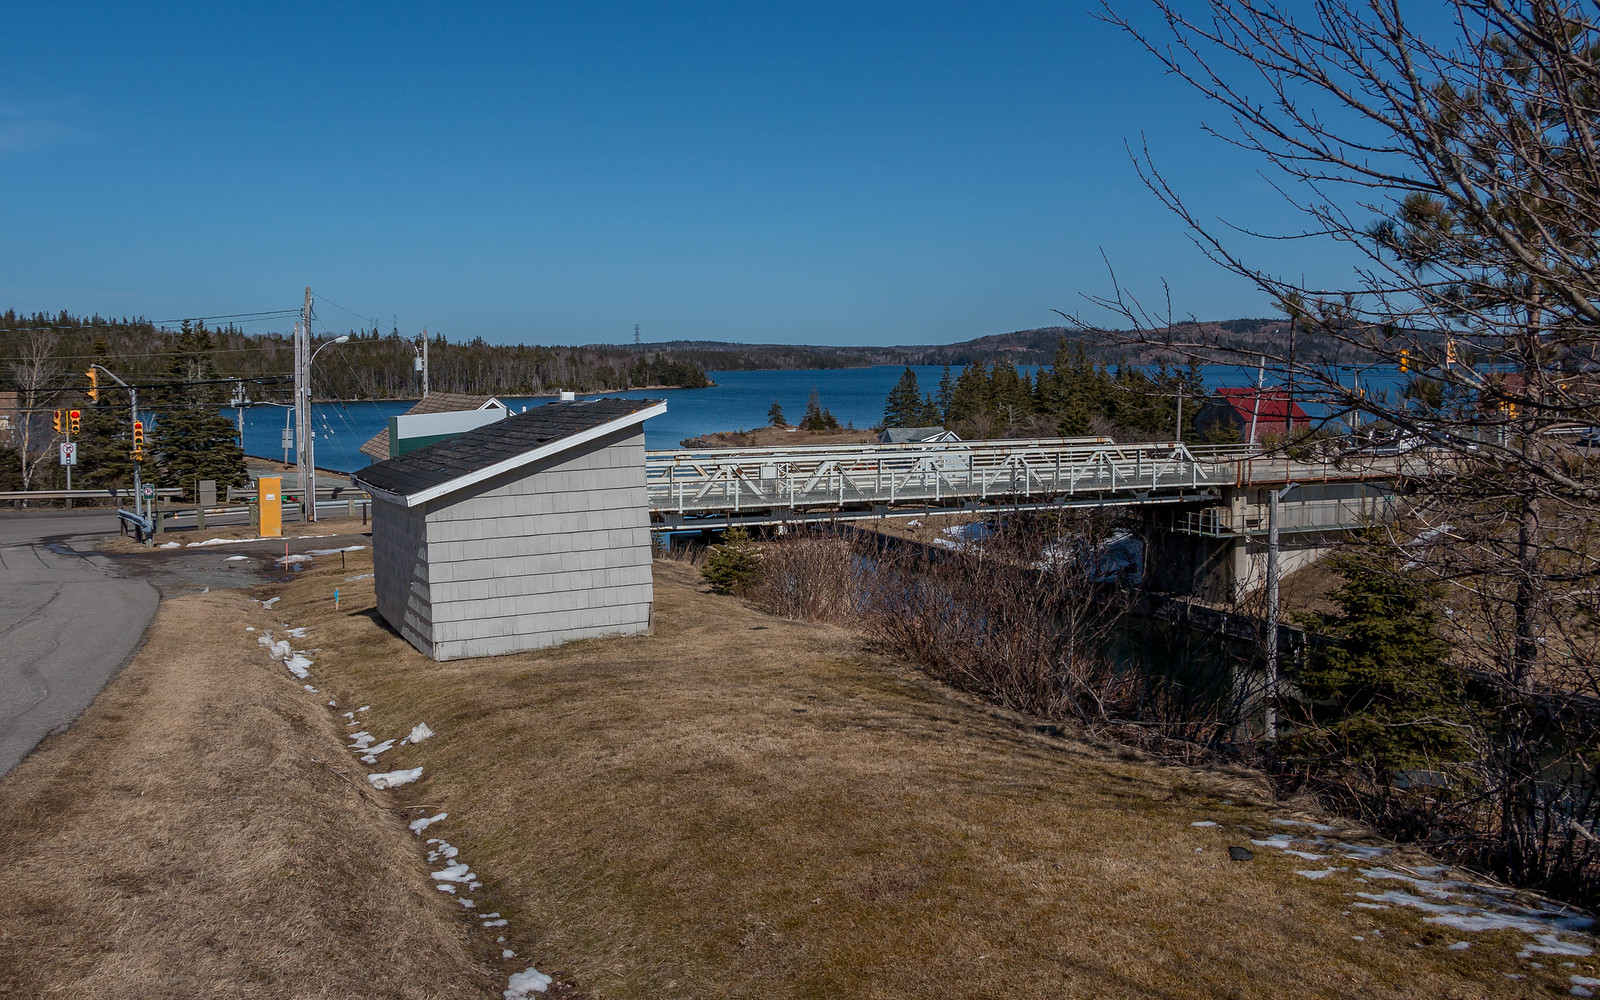 Swing bridge (looking toward the Bras d'Or Lake).